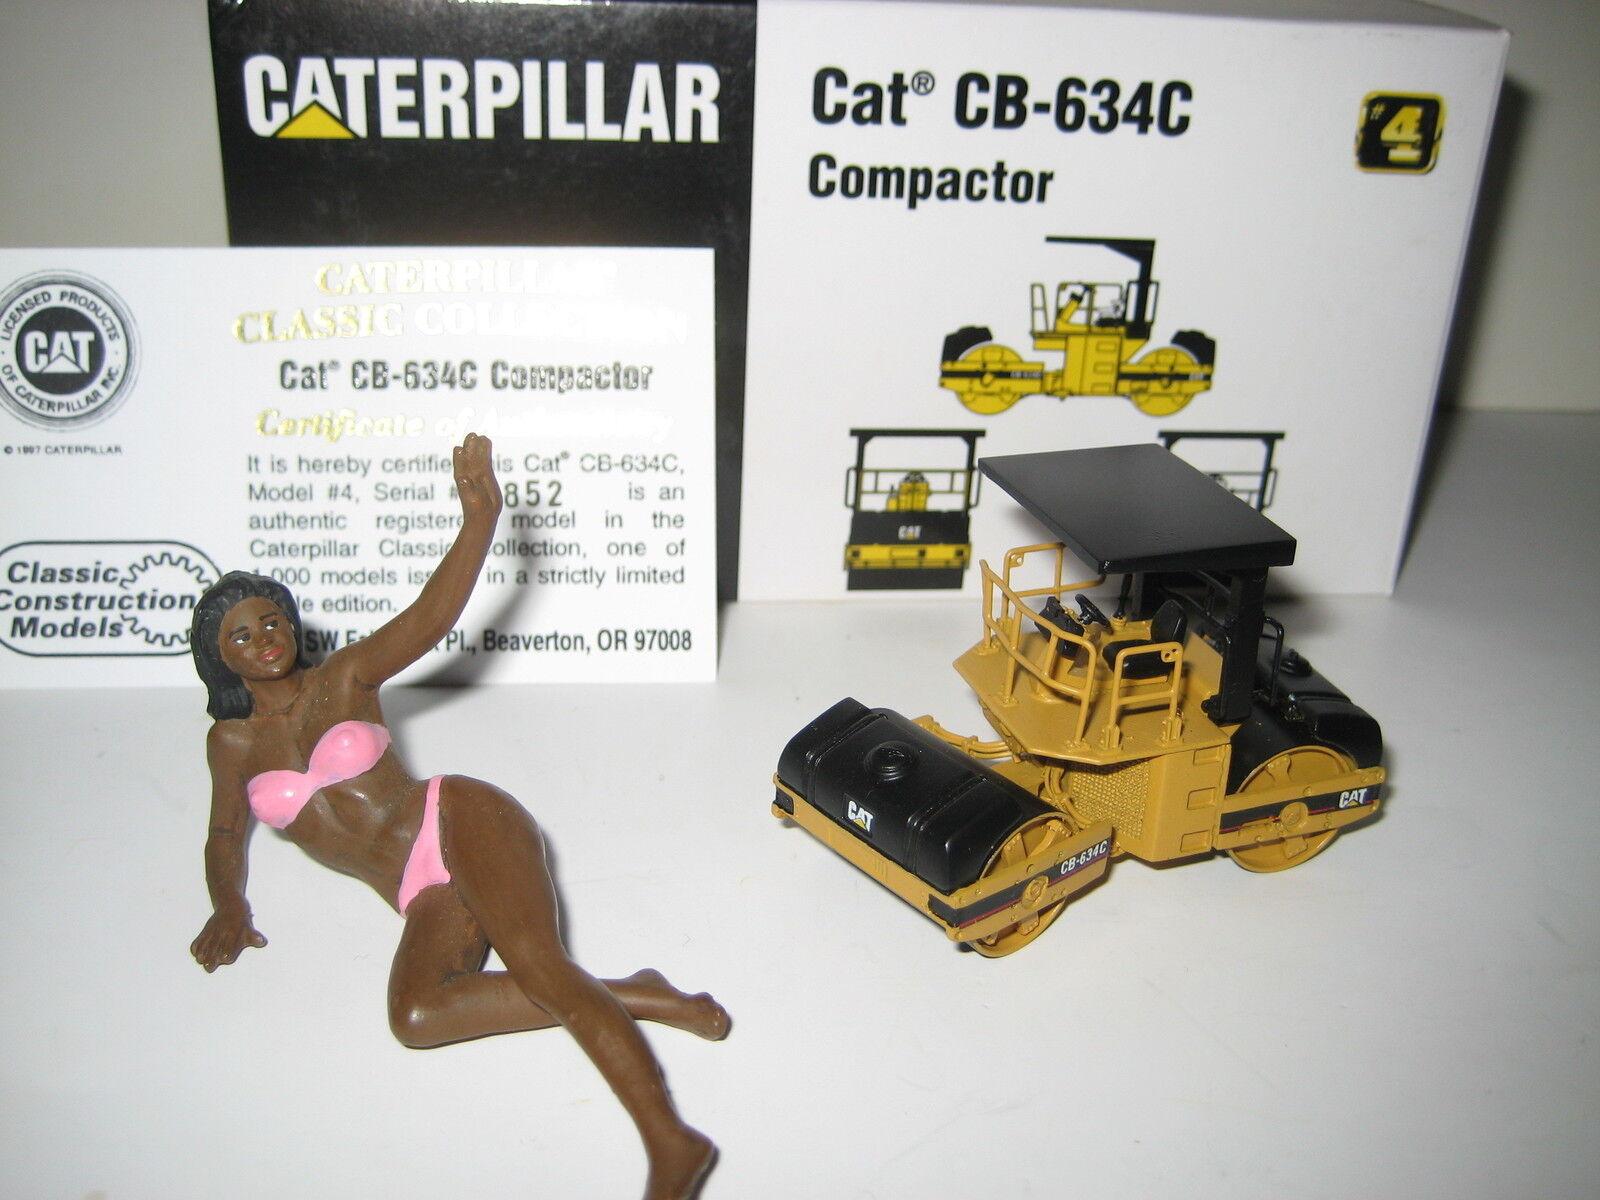 grandes ahorros Caterpillar Caterpillar Caterpillar cb-634c platina  852 ccm 1 87 OVP edición limitada  presentando toda la última moda de la calle